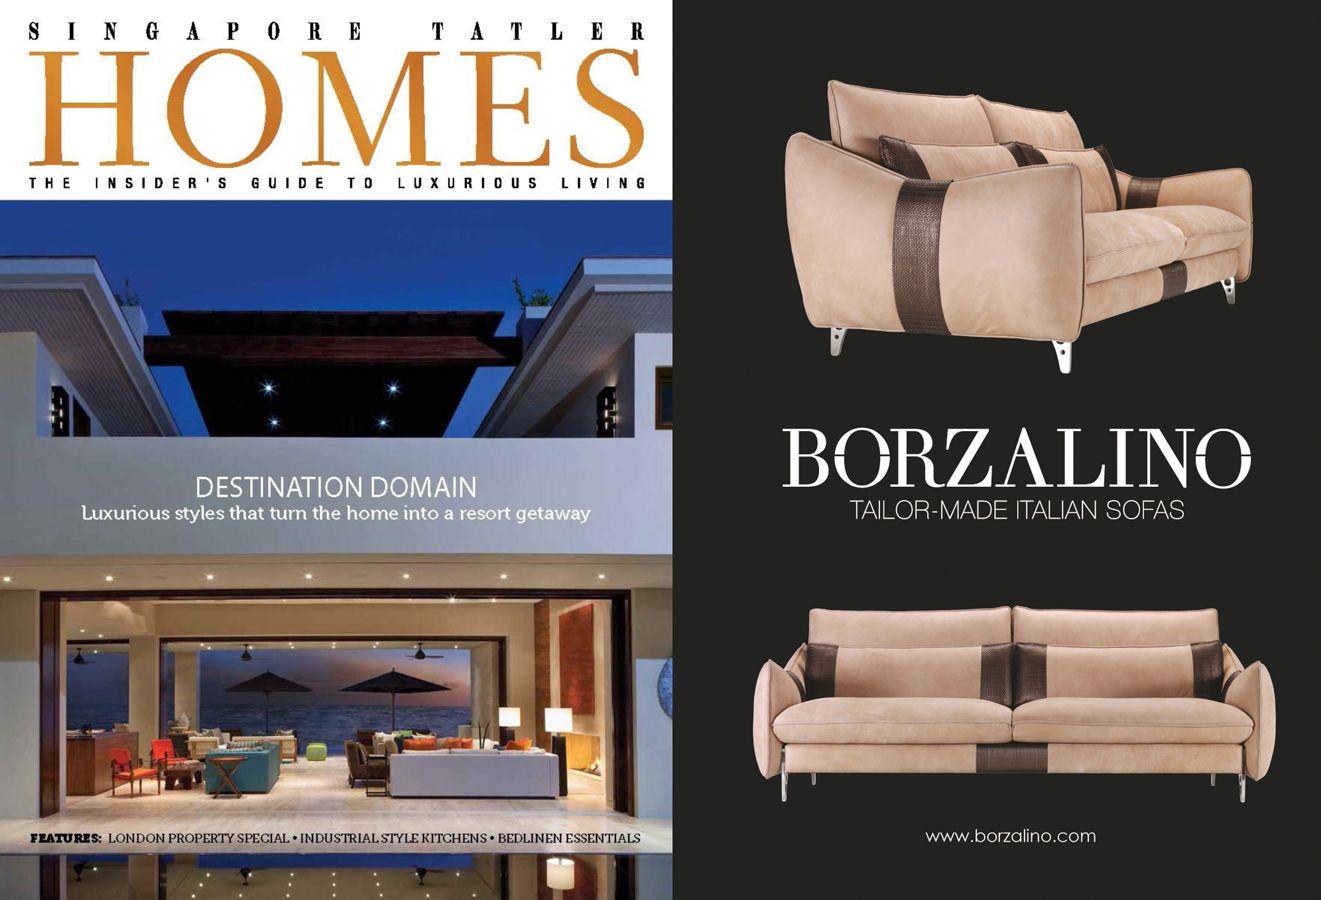 BORZALINO ADV on June-July 2014 issue of Singapore Tatler HOMES magazine